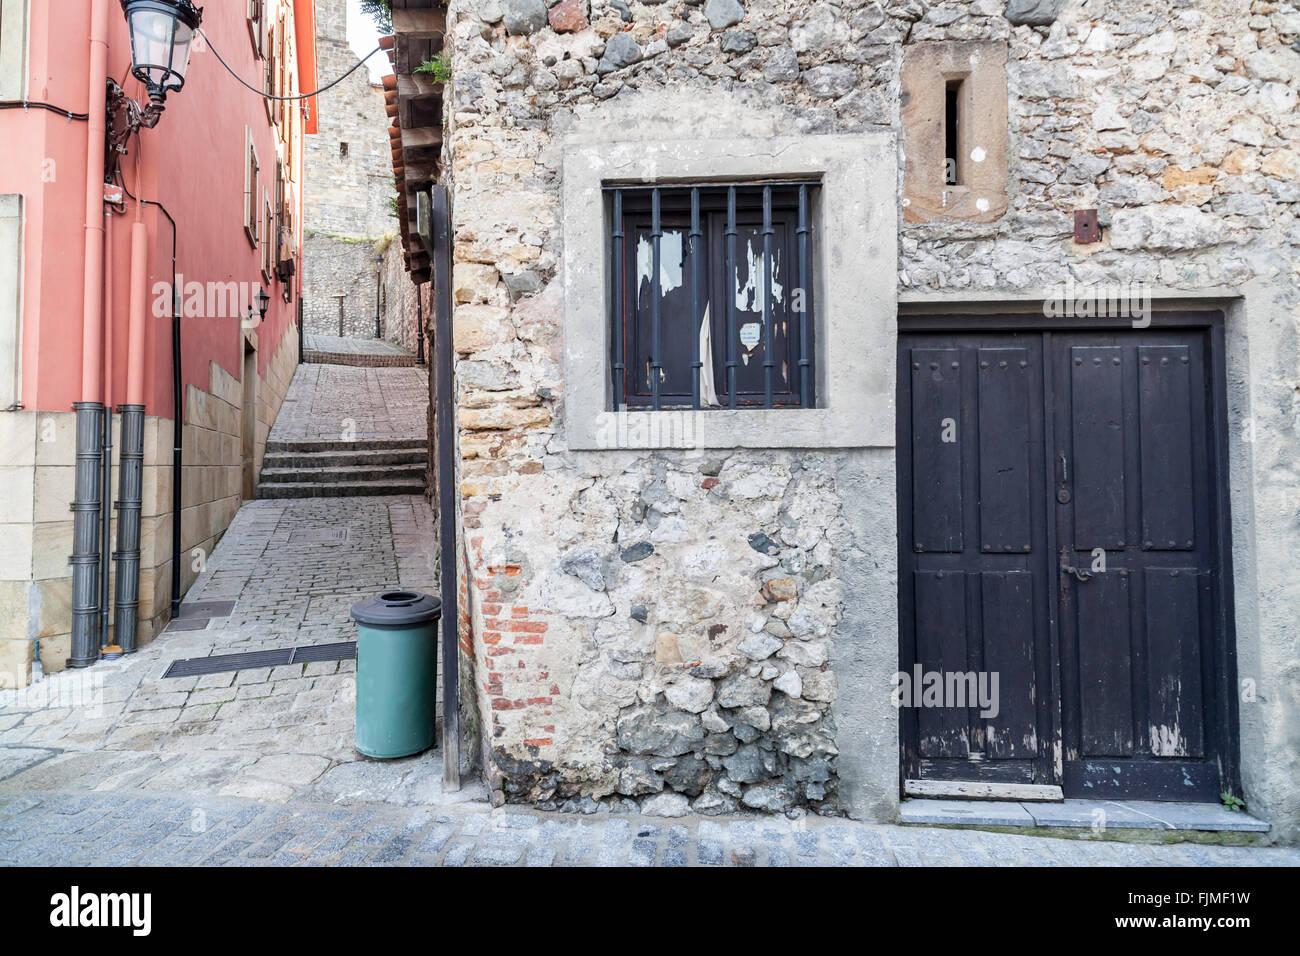 Puebla Vieja.Laredo,Cantabria,Spain - Stock Image